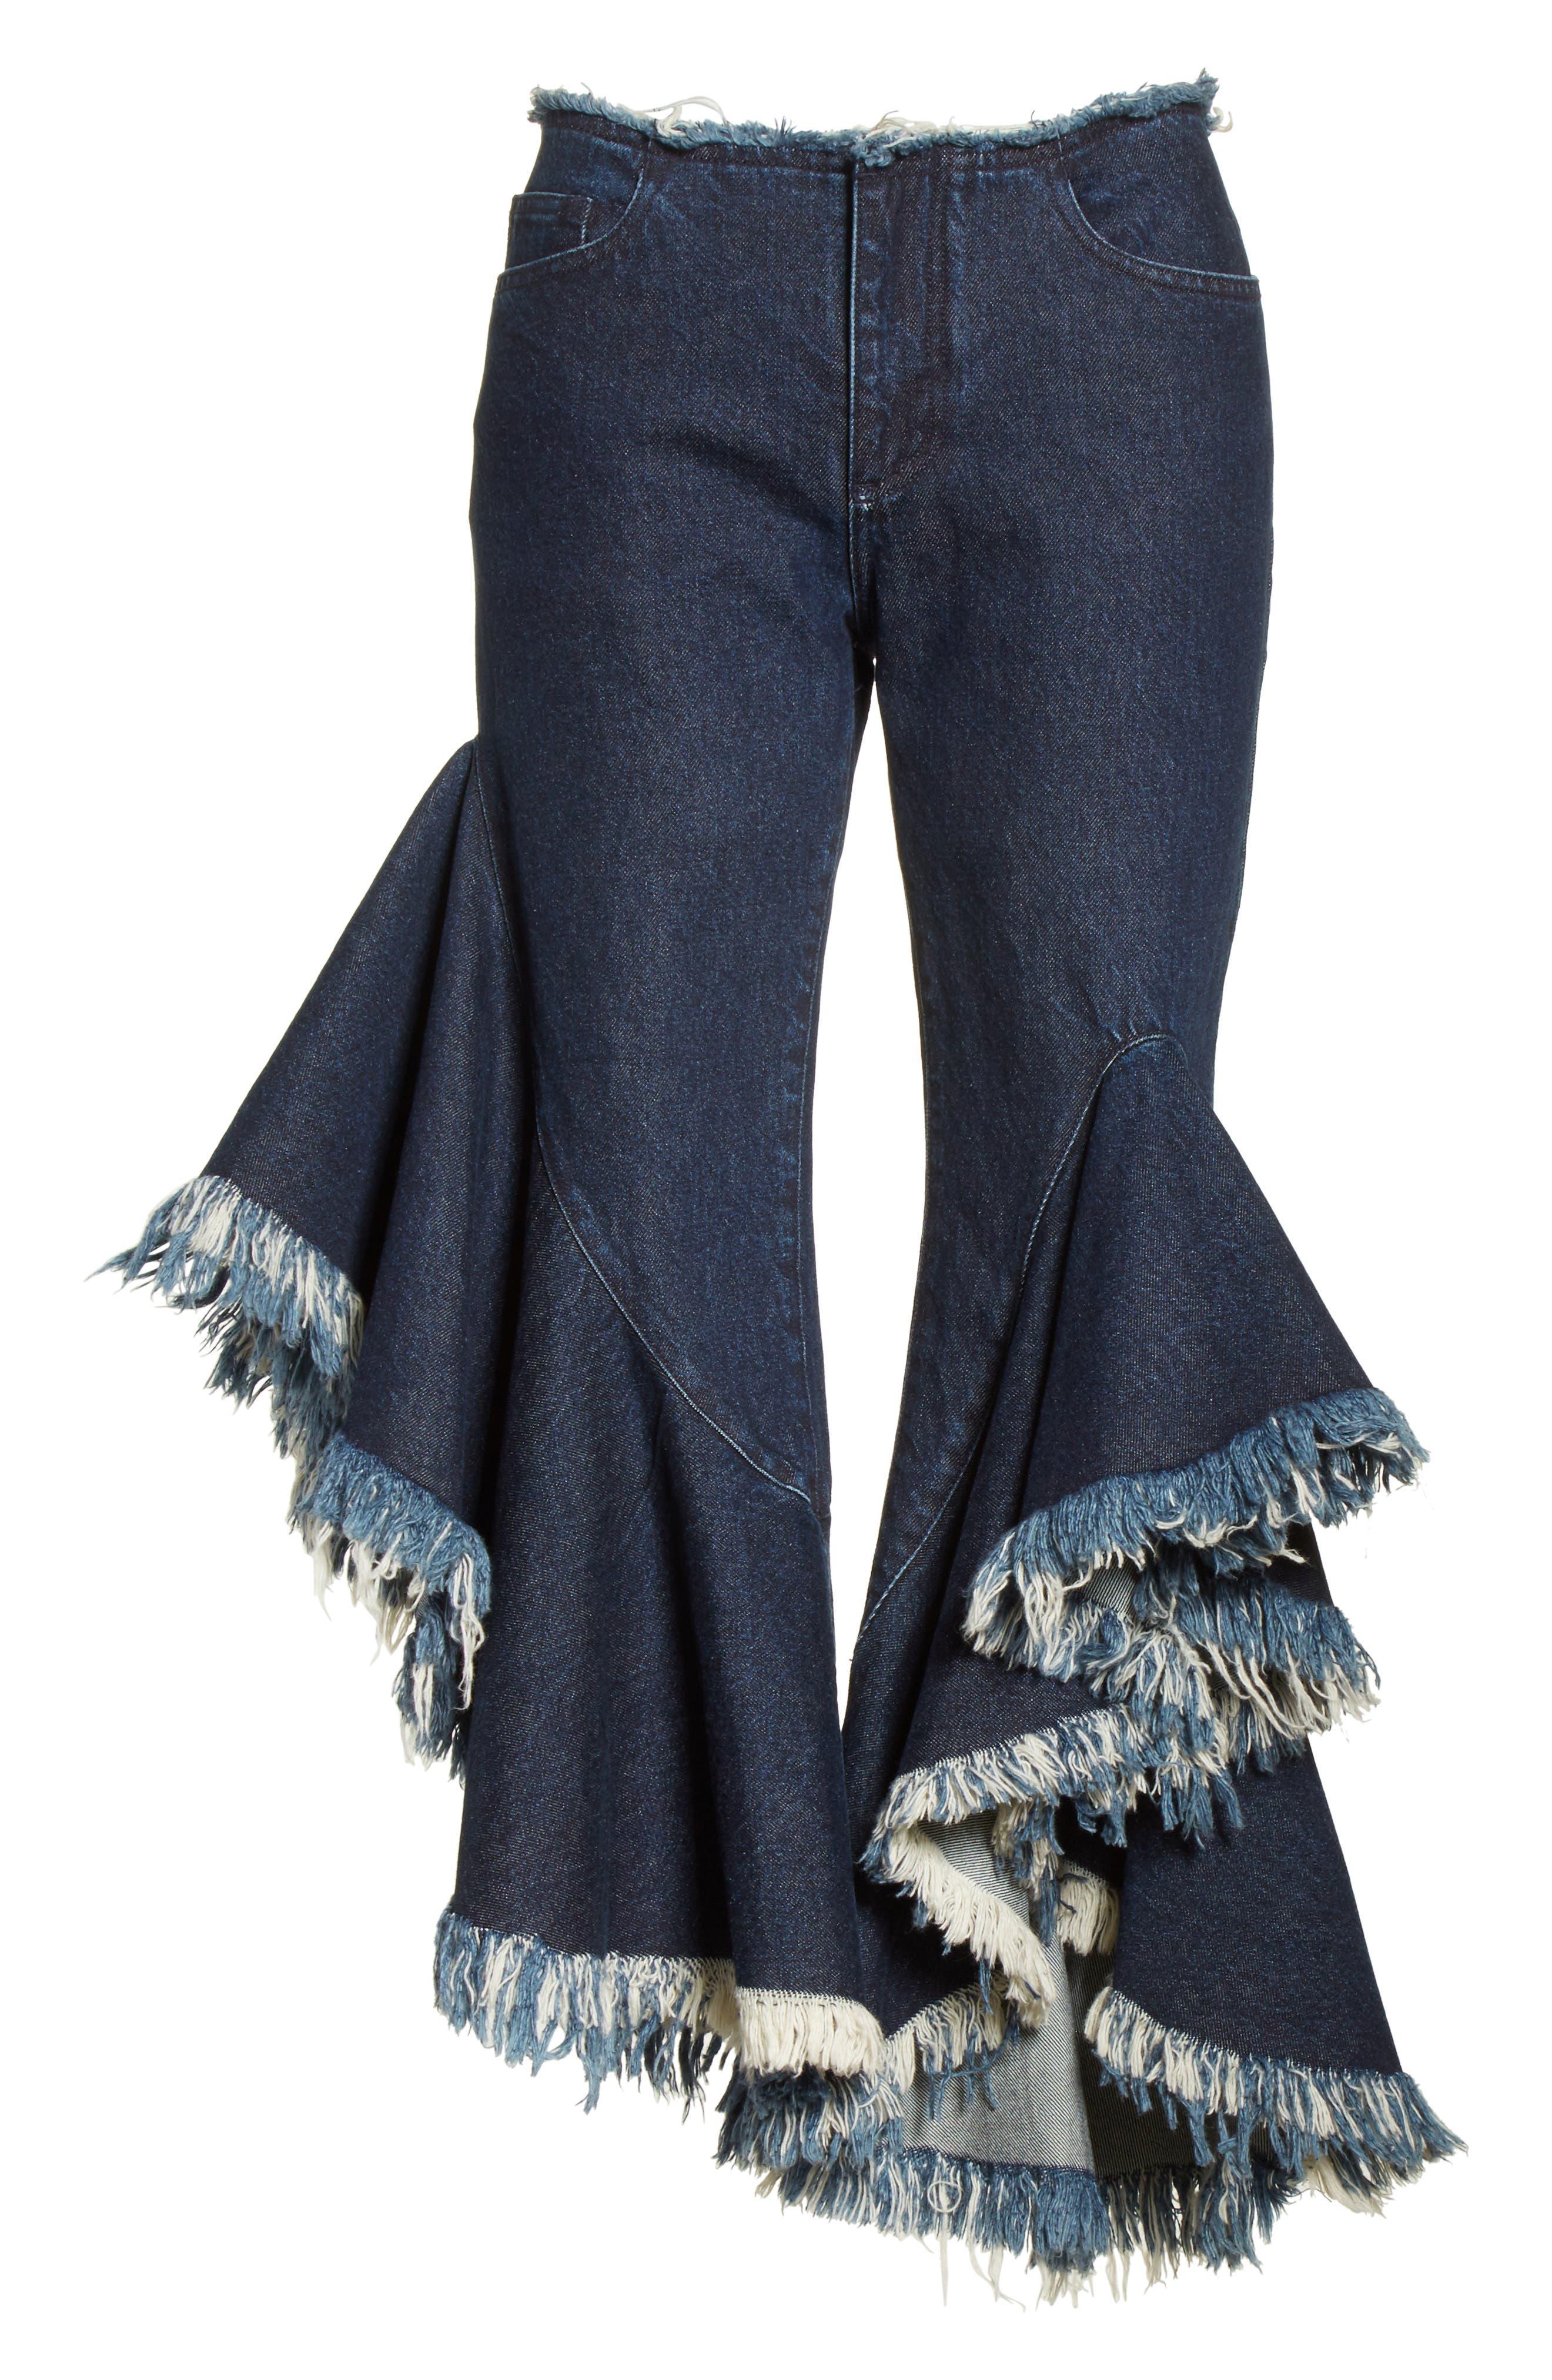 Marques'Almeida Frill Flare Crop Jeans,                             Alternate thumbnail 9, color,                             Indigo